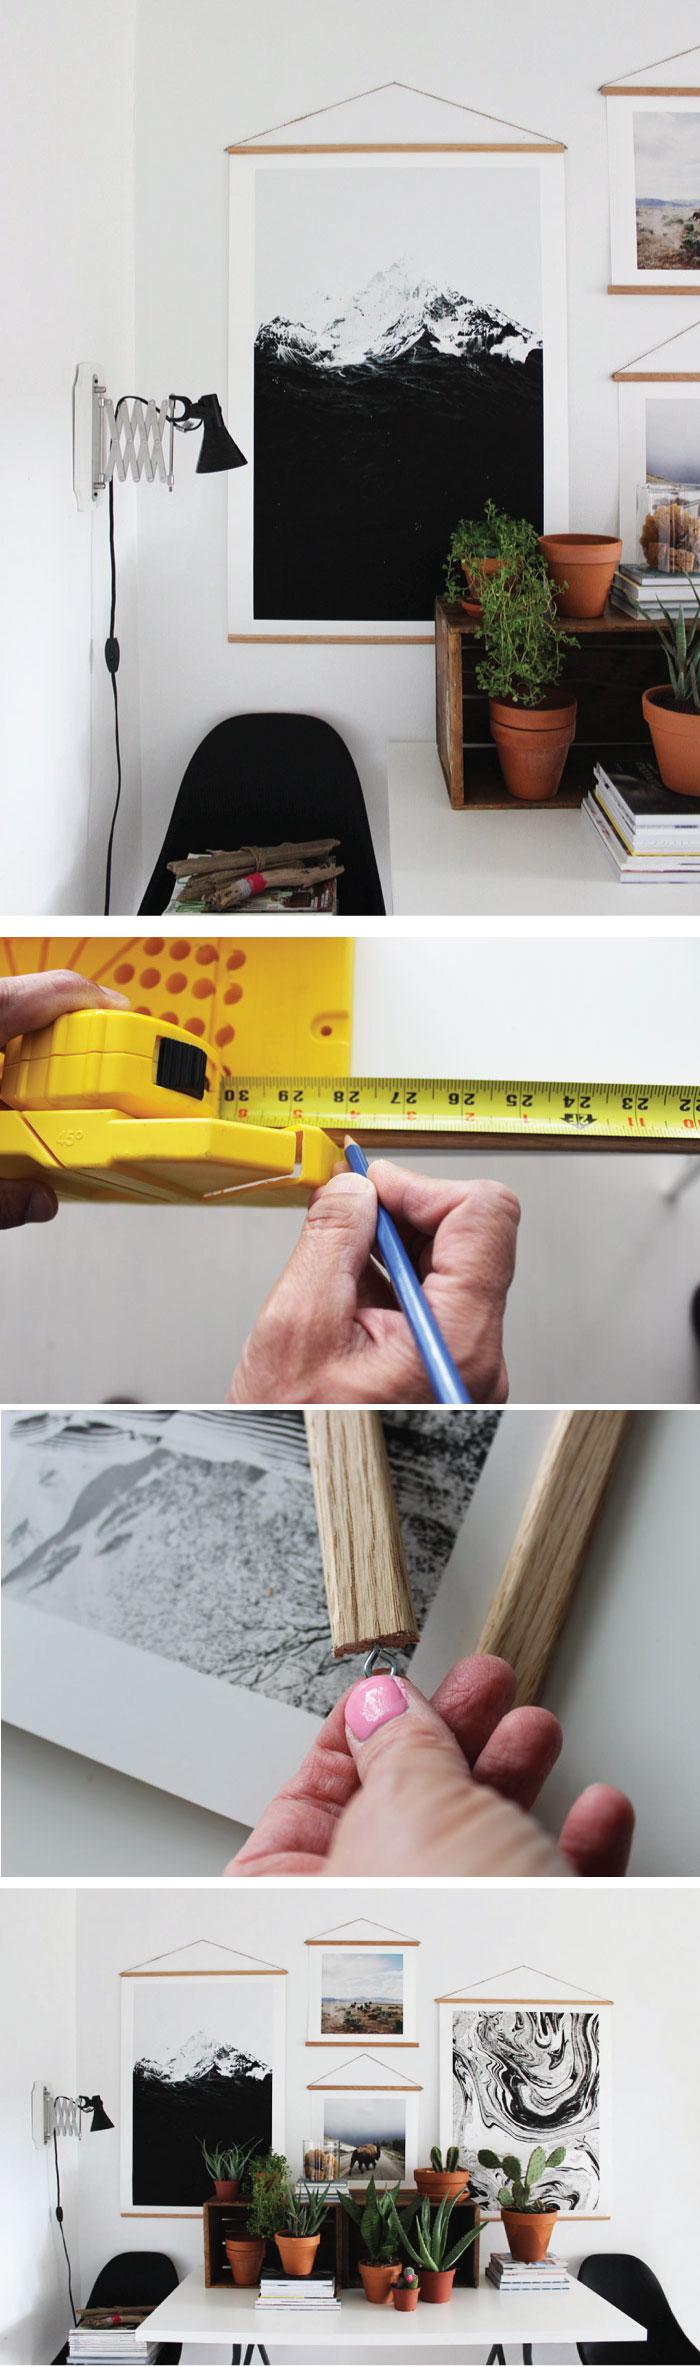 easy diy dowel rod frames diy home pinterest deko diy deko und zuhause. Black Bedroom Furniture Sets. Home Design Ideas